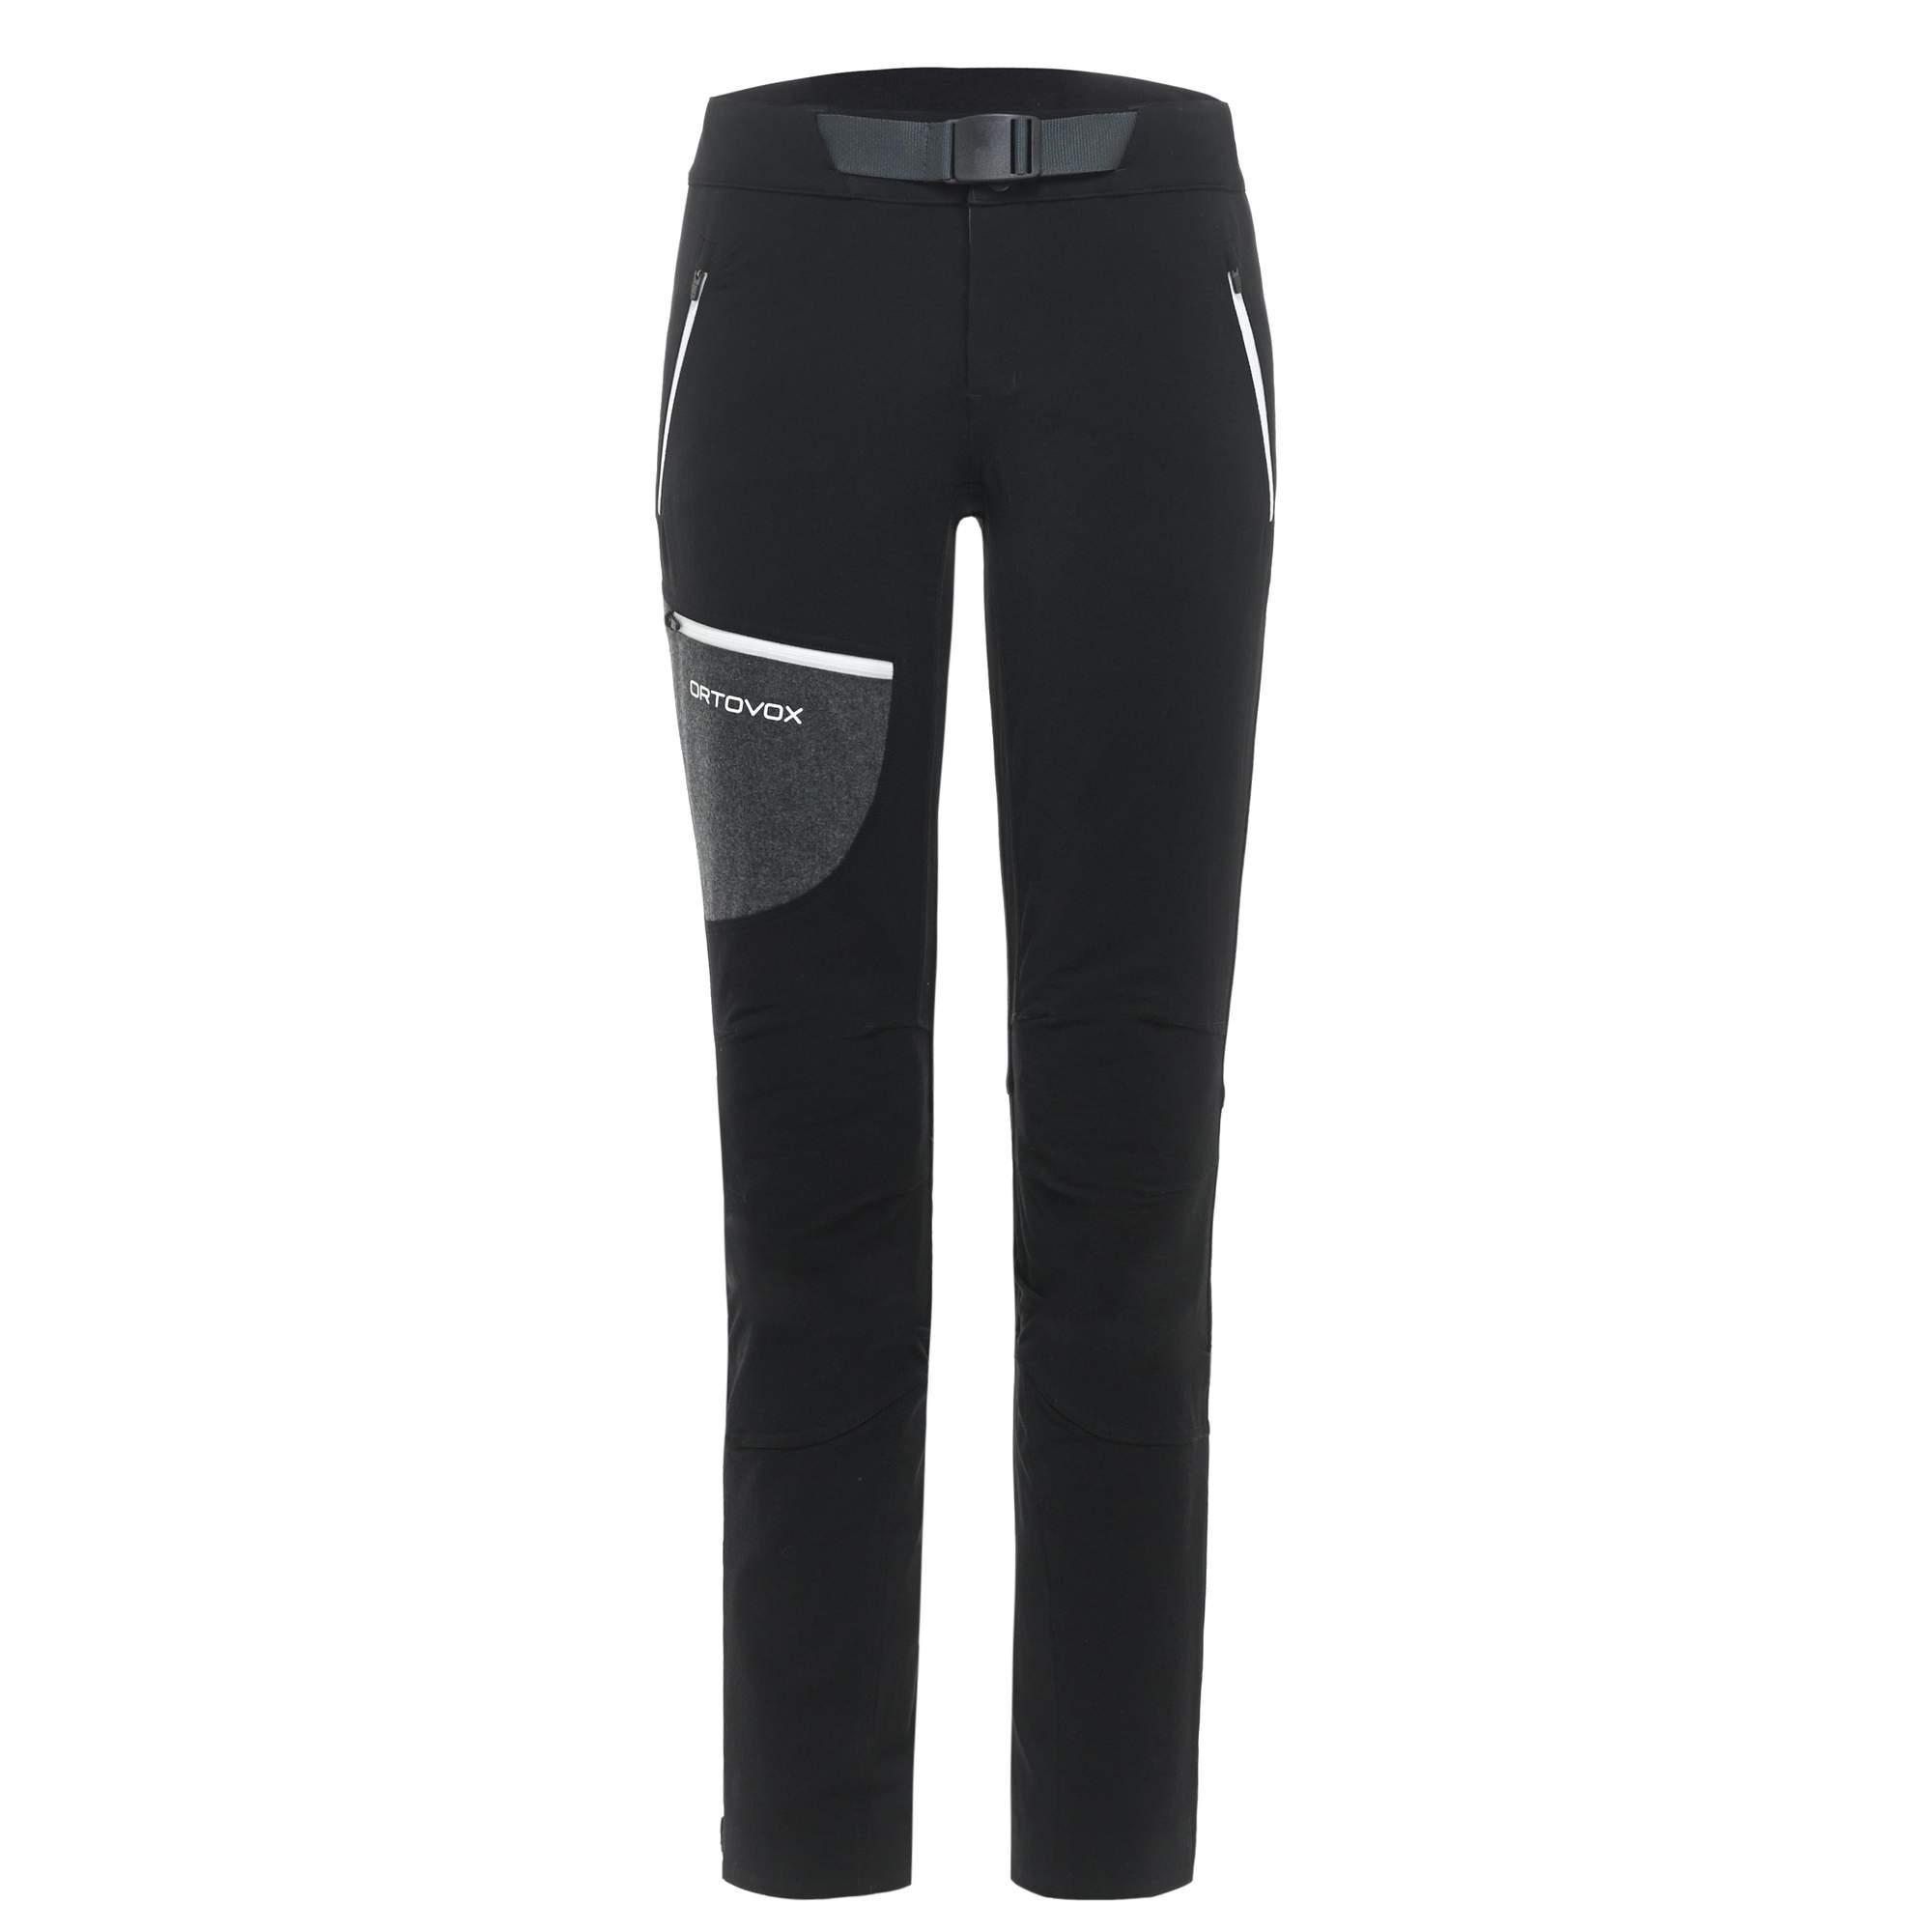 Ortovox Cevedale Pants Frauen Gr. L - Softshellhose - schwarz